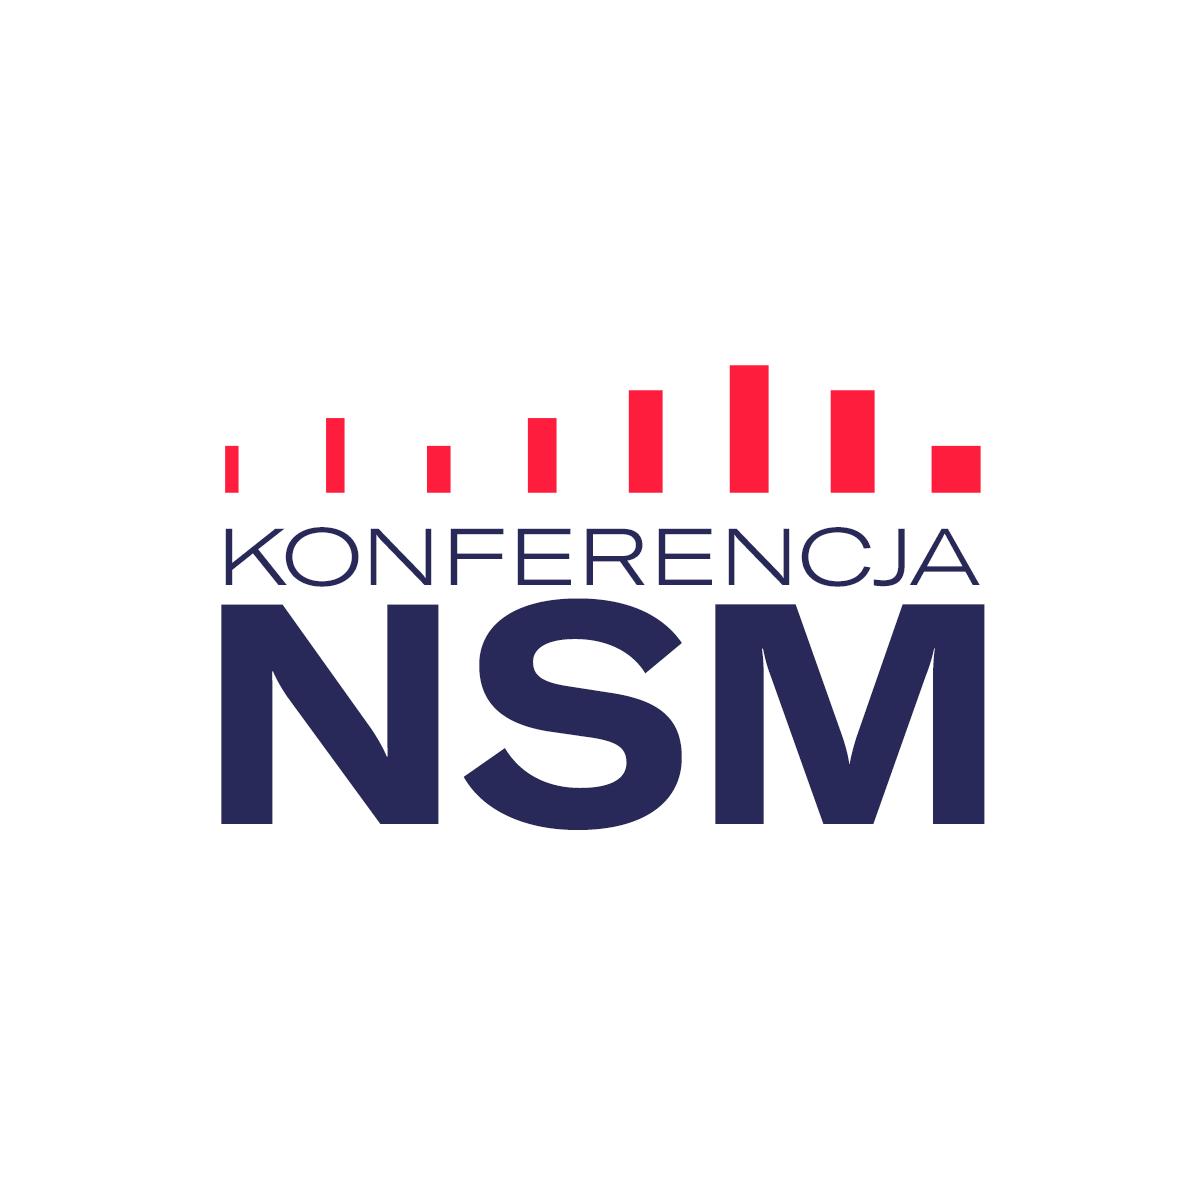 konferencja-nsm